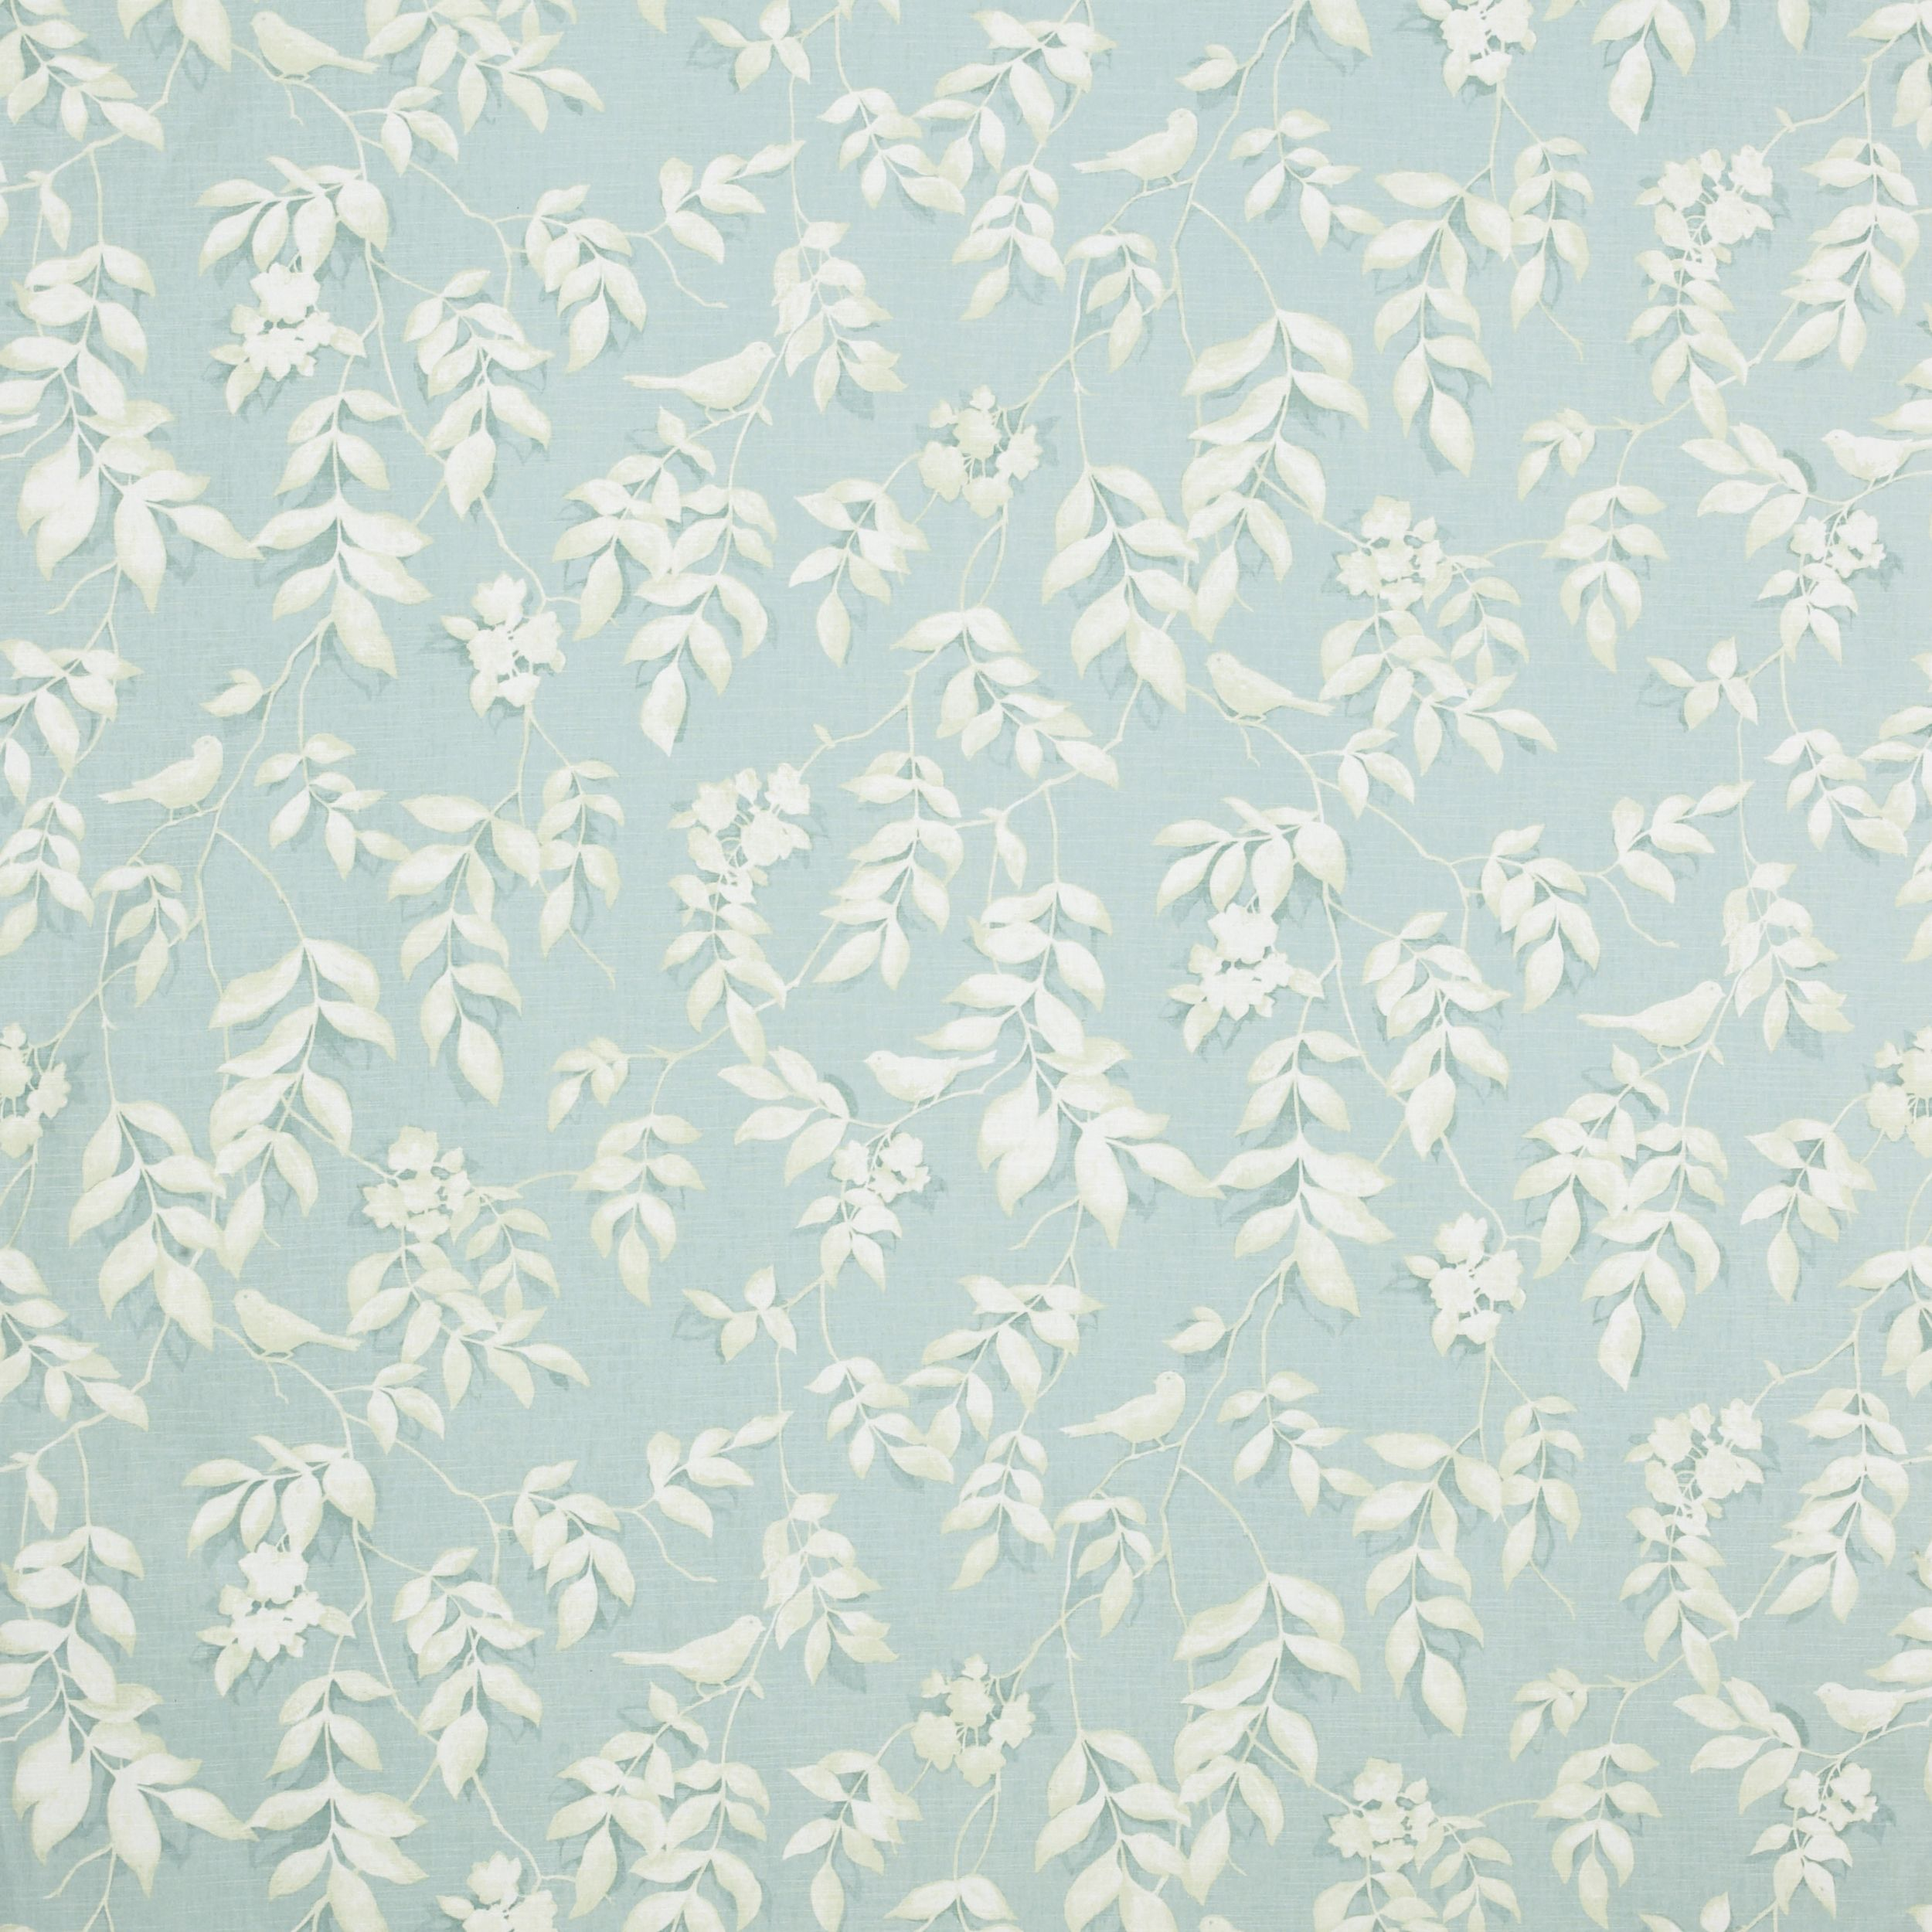 Laura Ashley Lockwood Print Cotton Linen Curtain Fabric Duck Egg